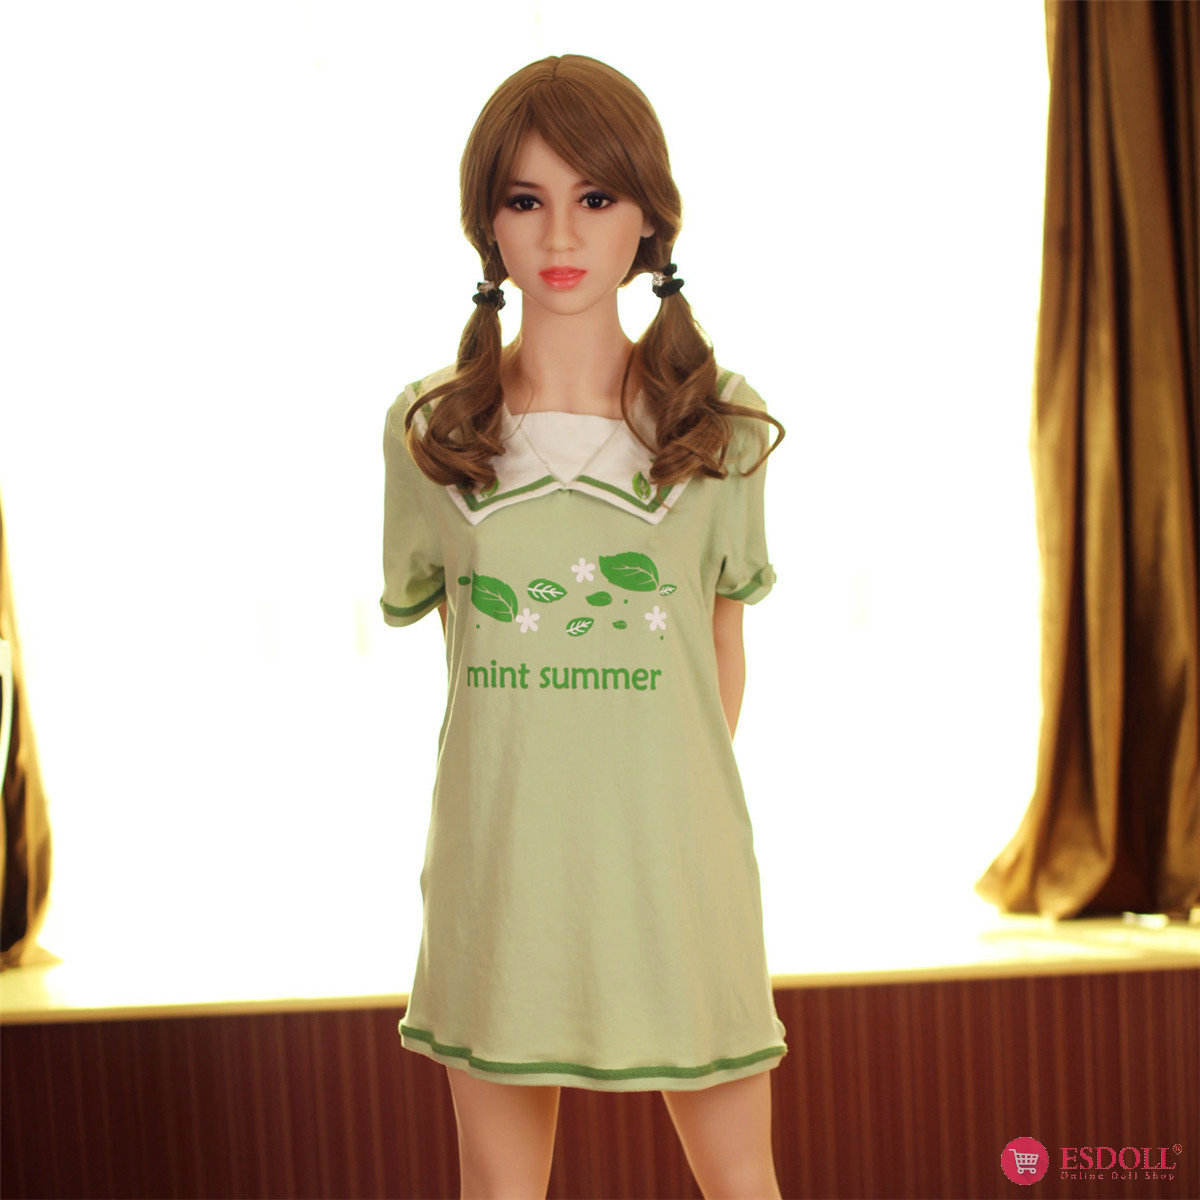 153cm Eva sex doll - 5